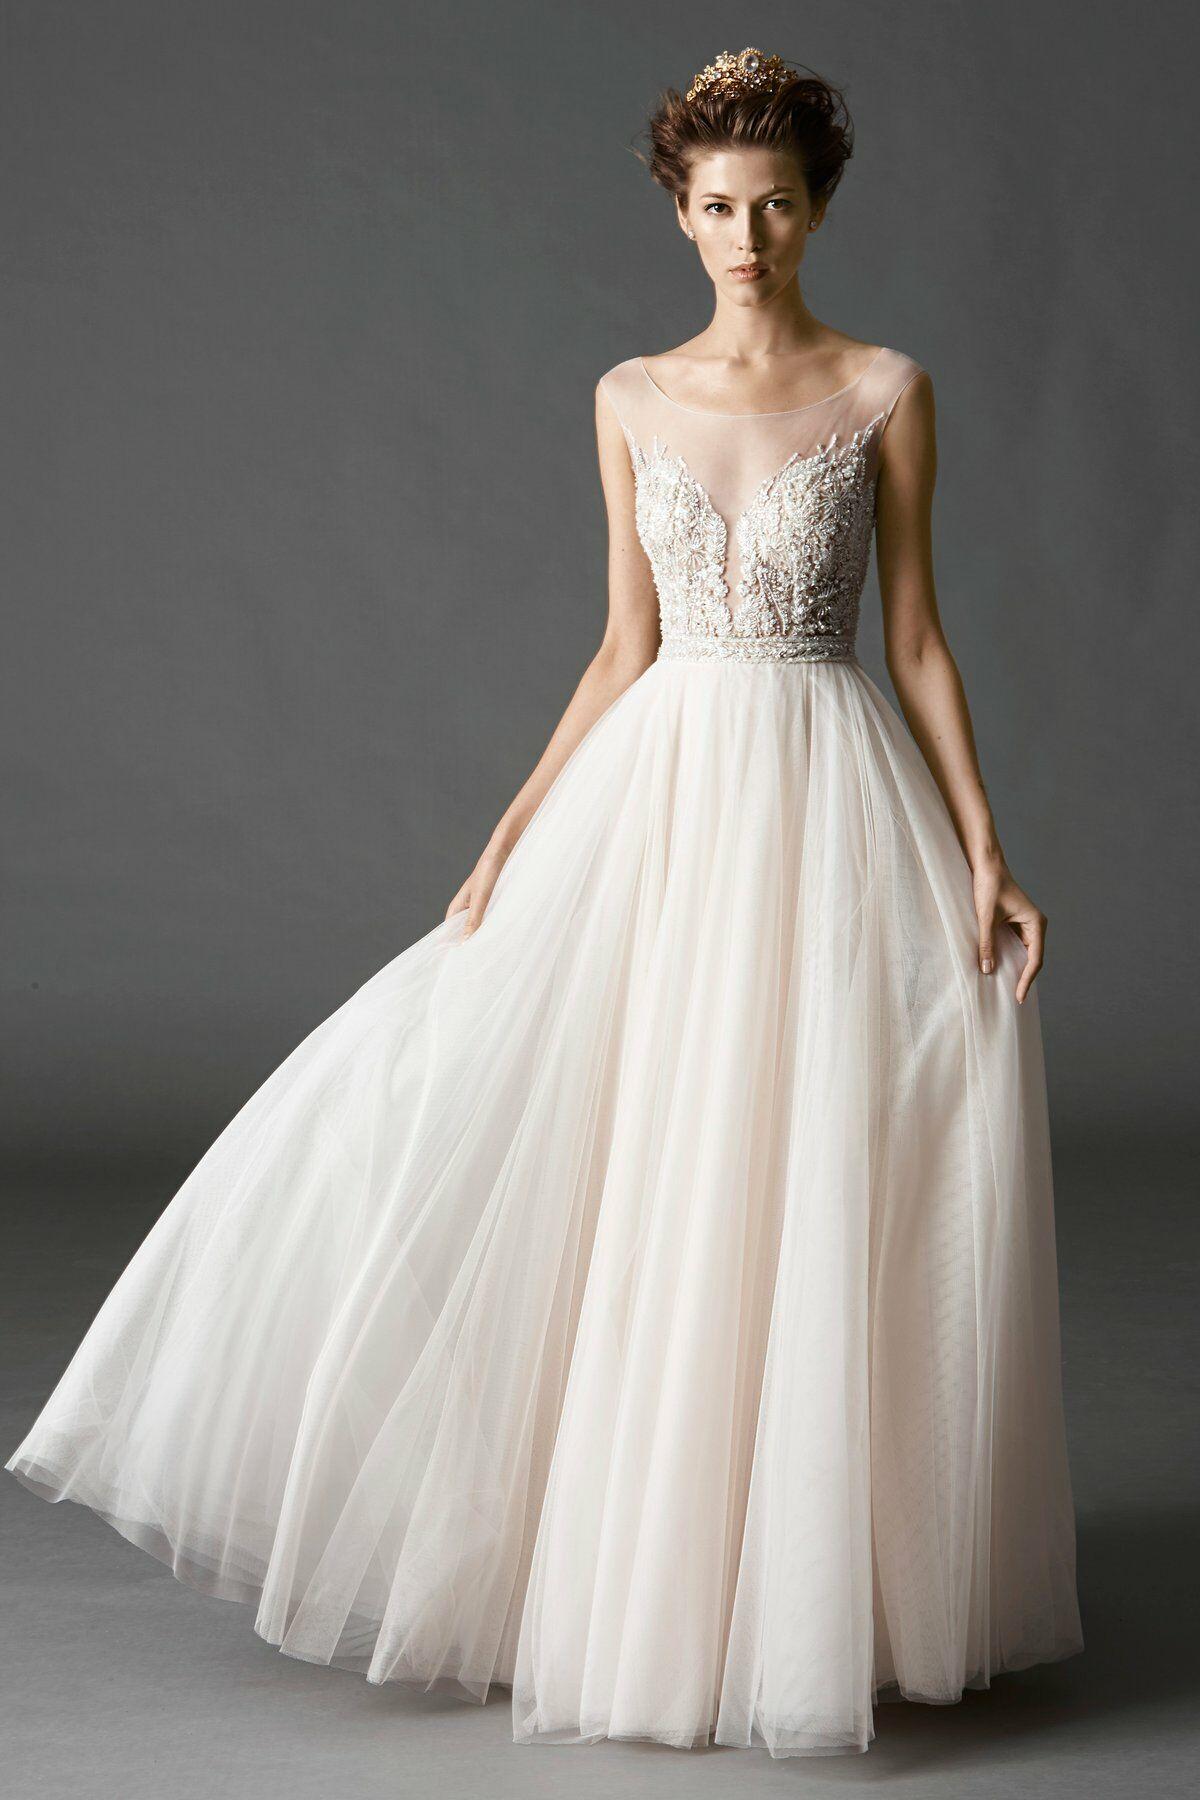 3087fa8846 The Wedding Store at Liz Clinton